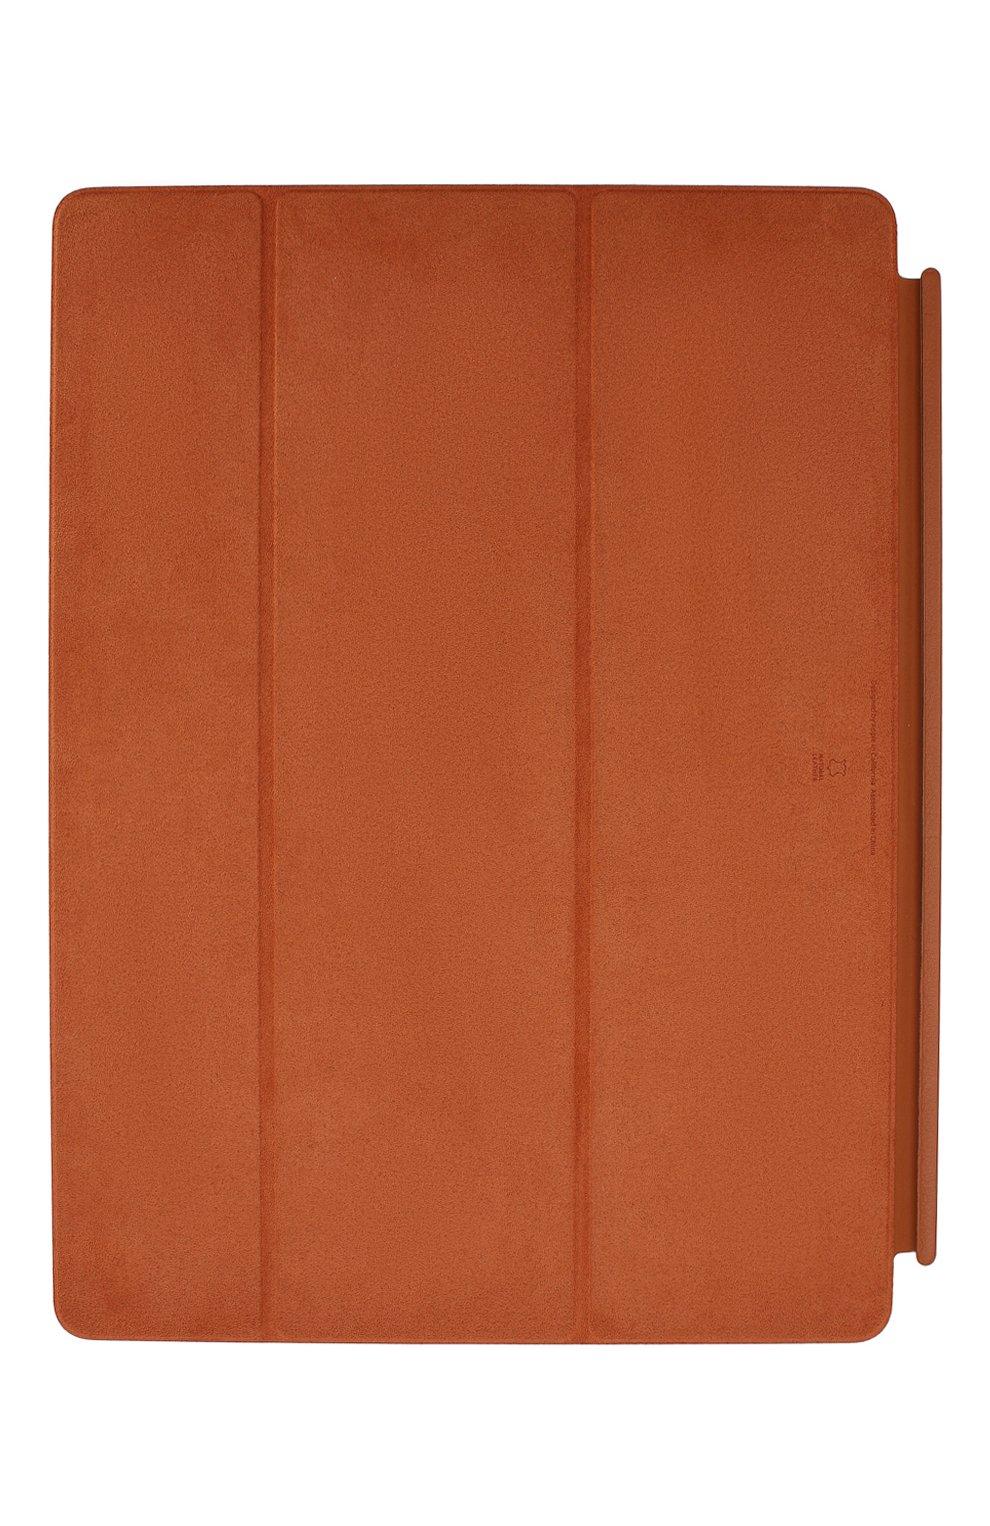 "Чехол smart cover для ipad pro 12.9"" APPLE  коричневого цвета, арт. MPV12ZM/A | Фото 2"